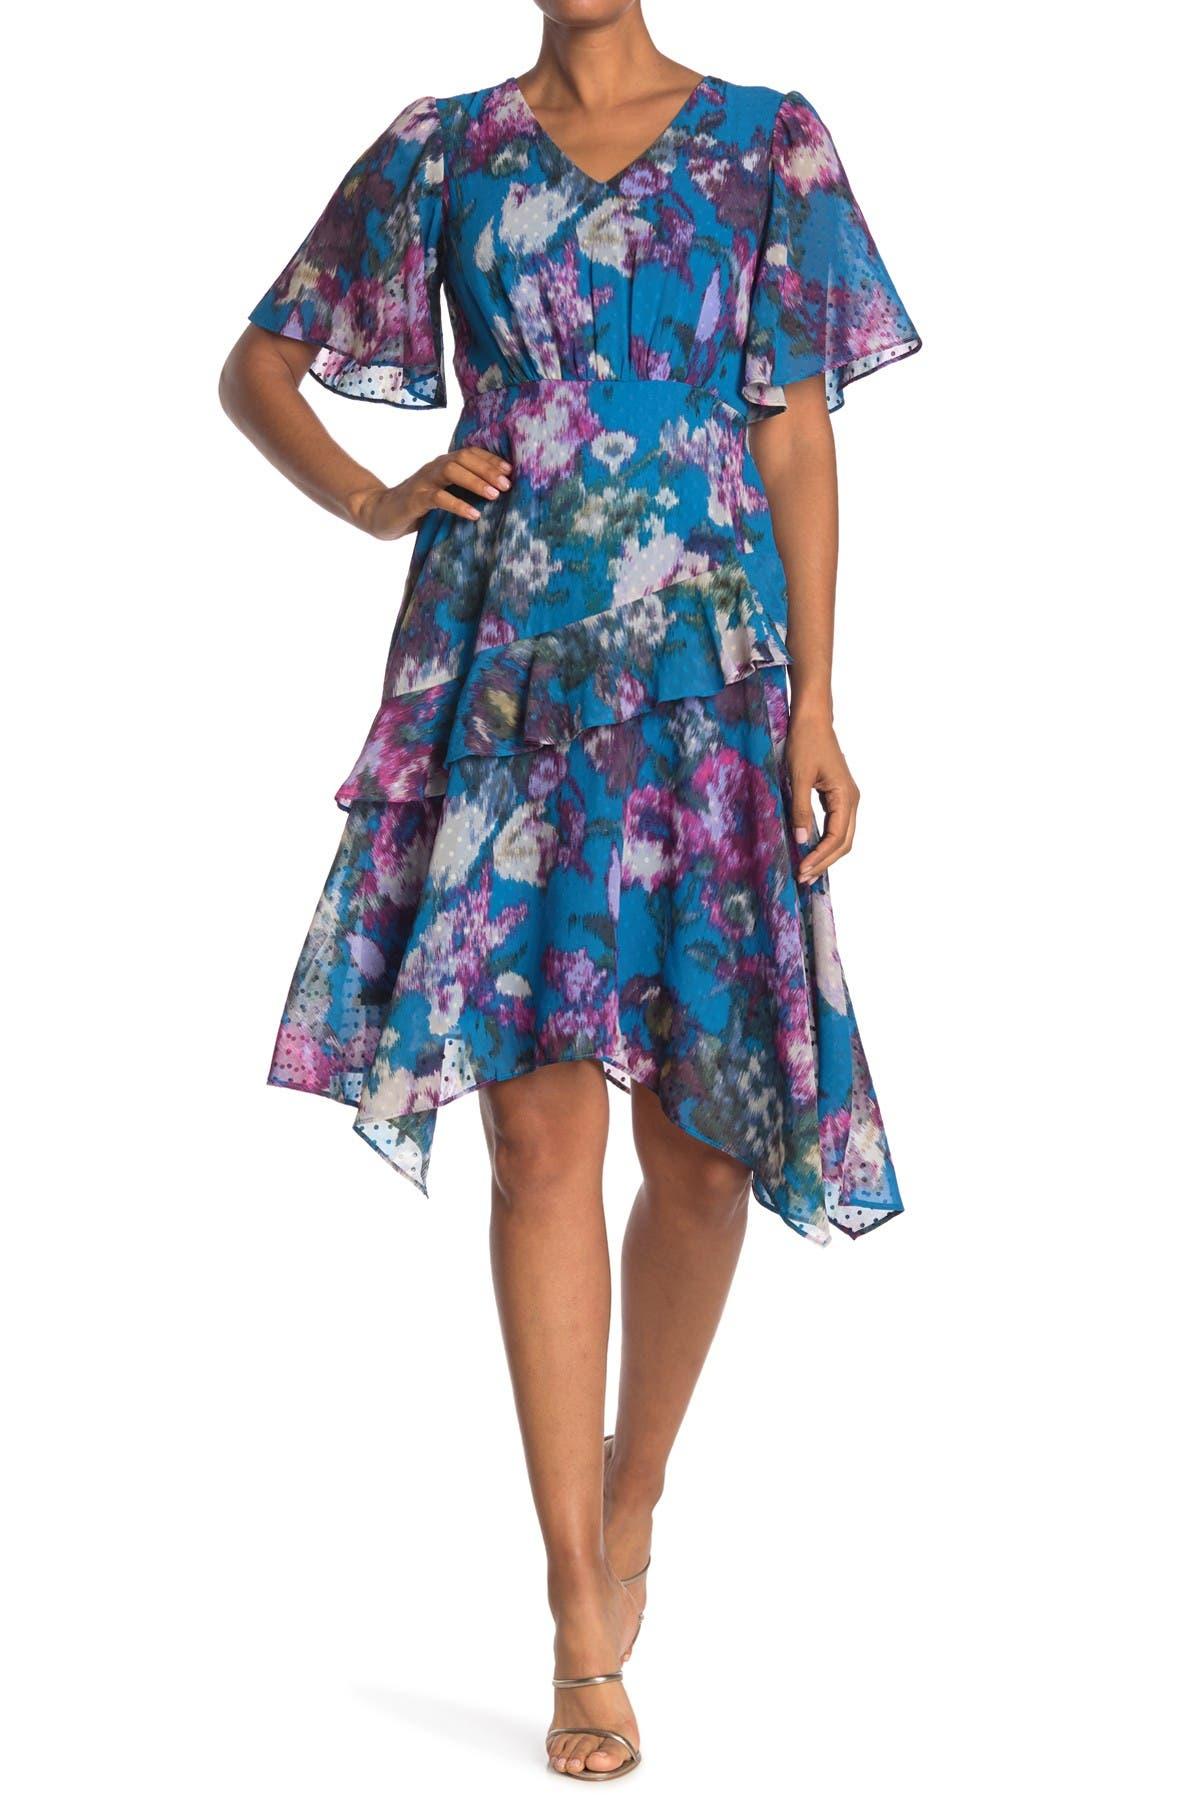 Image of Gabby Skye Short Sleeve Mini Dot Floral Ruffle Dress